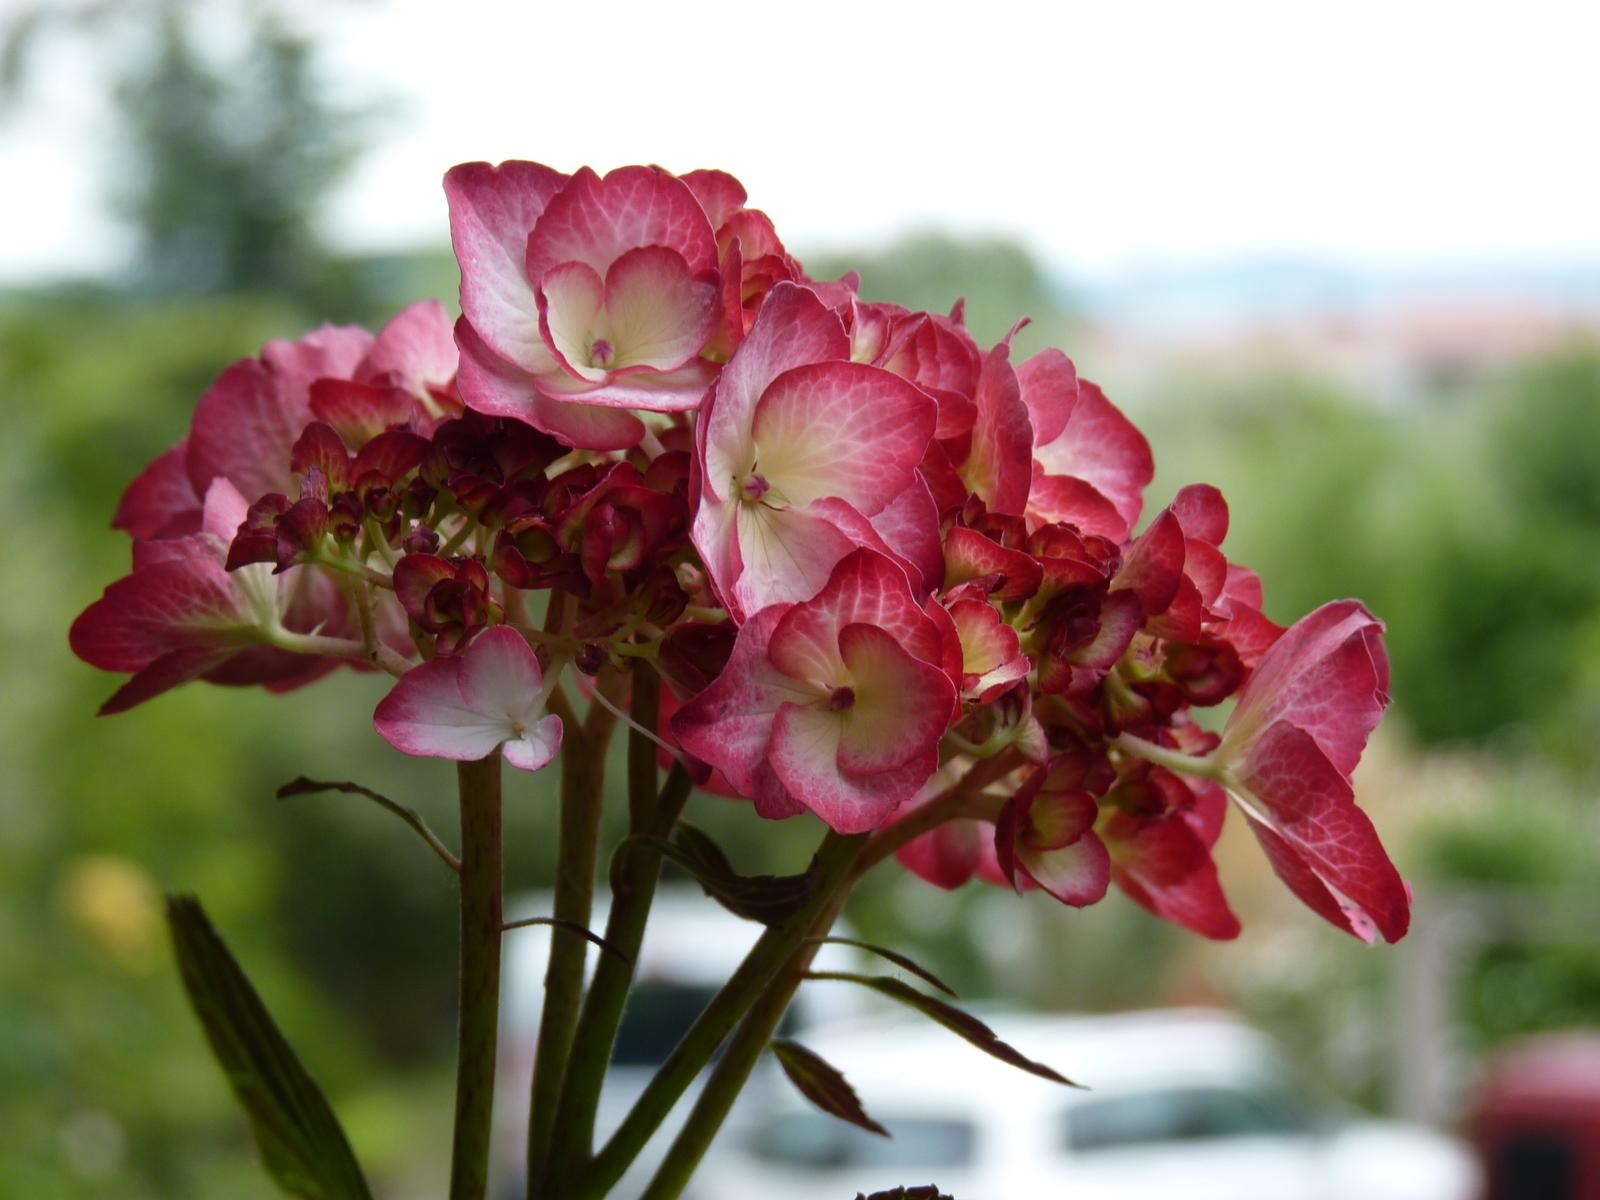 Ortensie Rampicanti Vendita : Produzione e vendita di ortensie in vaso